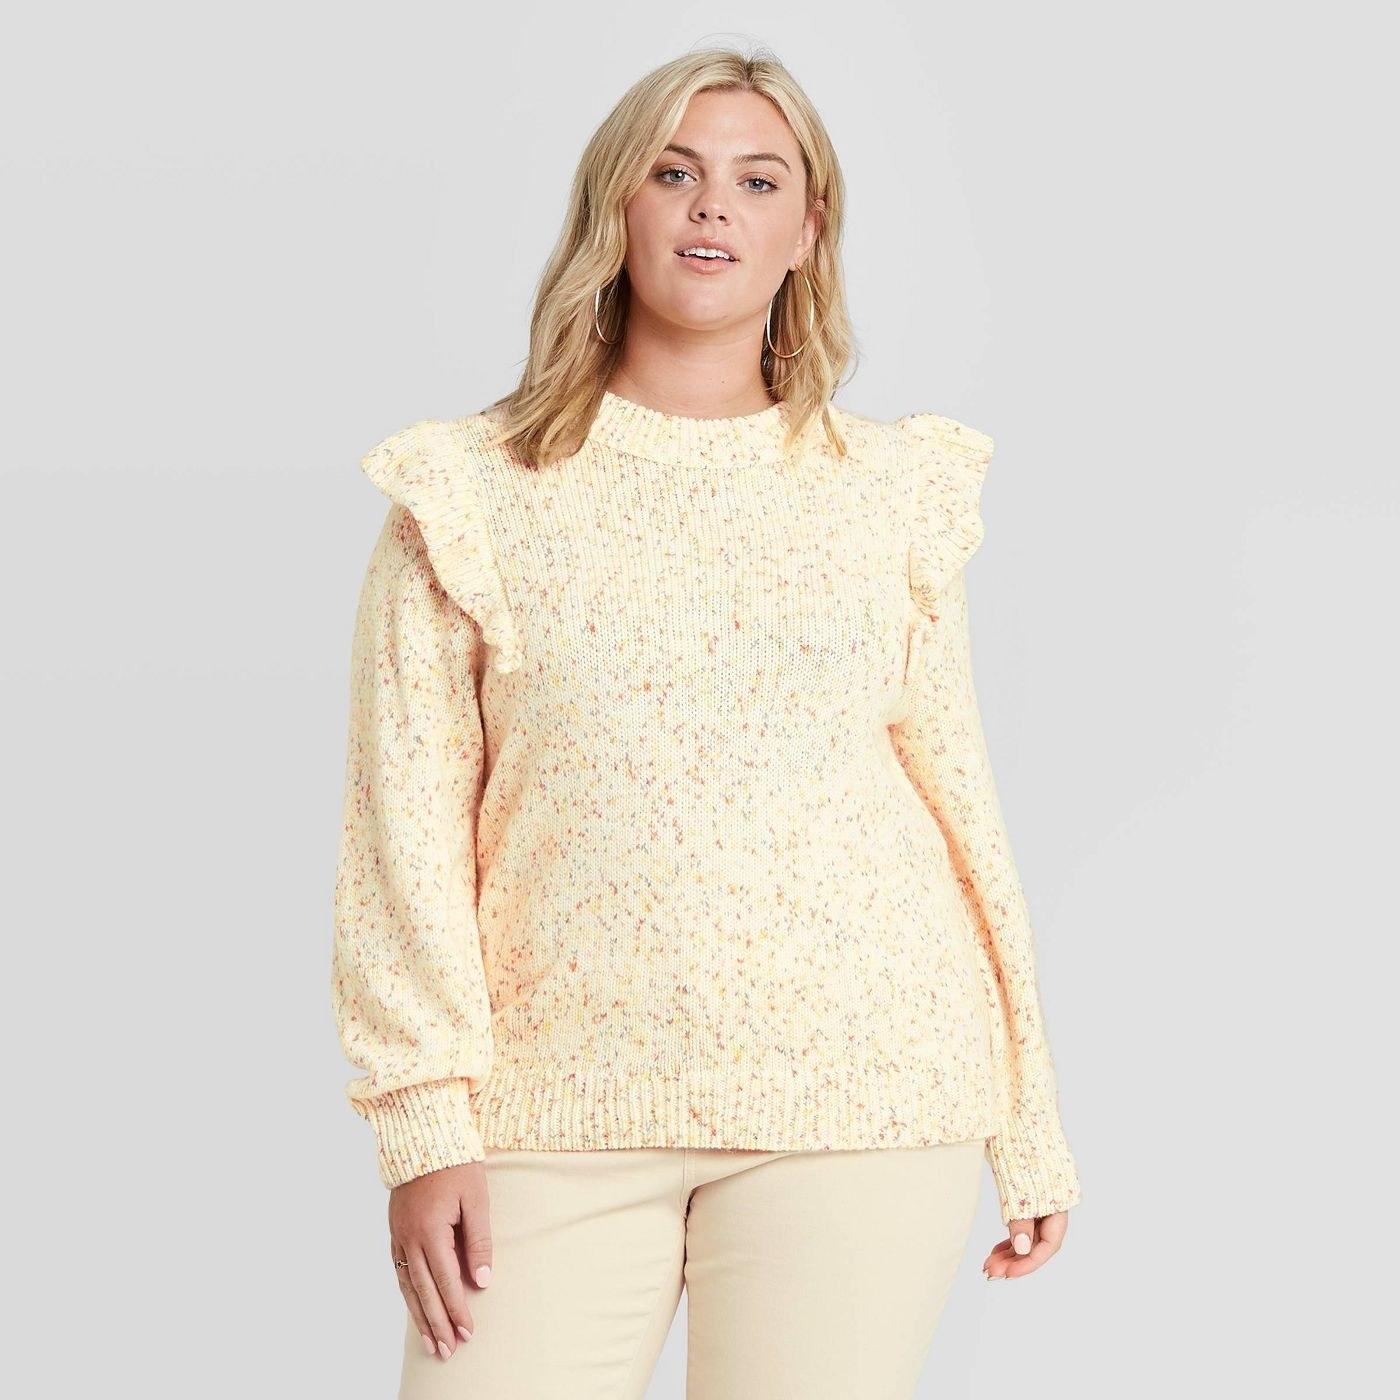 Model in crewneck pullover sweater